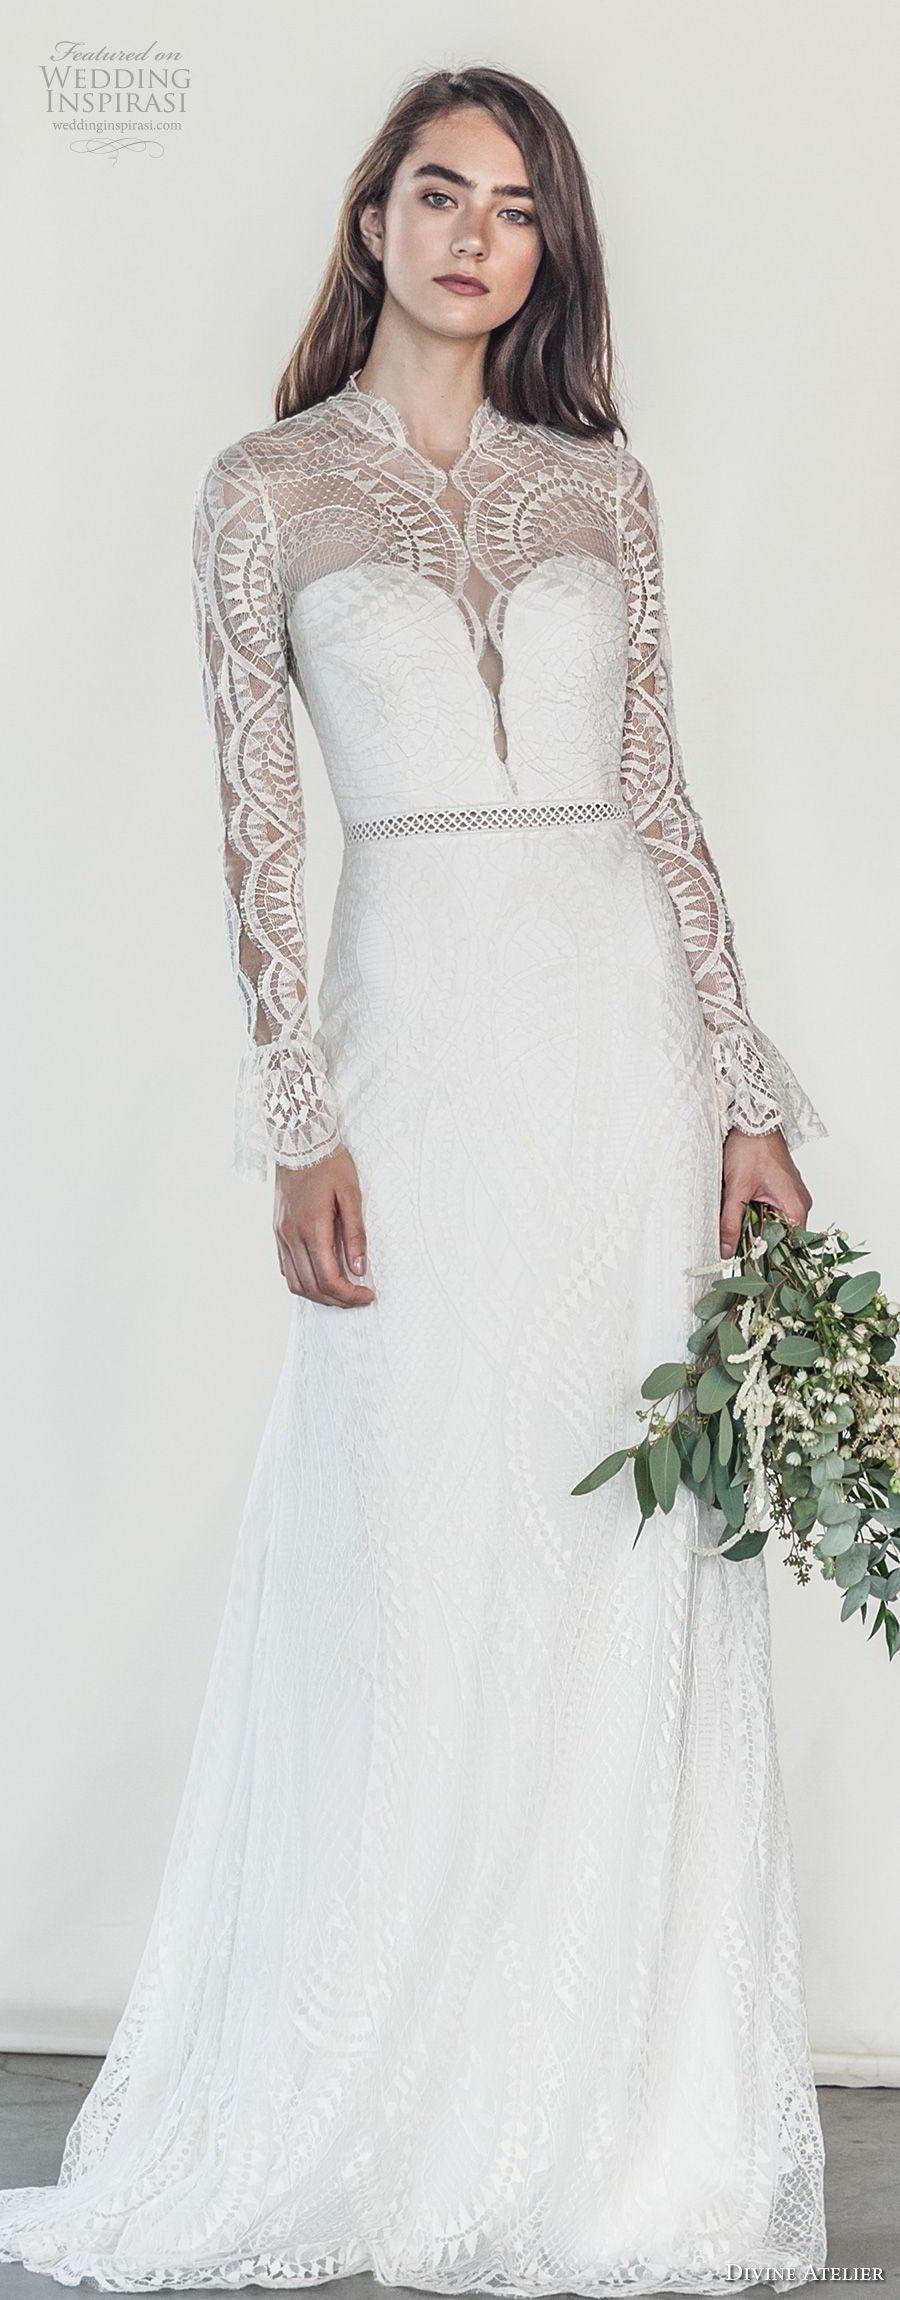 Divine atelier wedding dresses illusions bodice and wedding